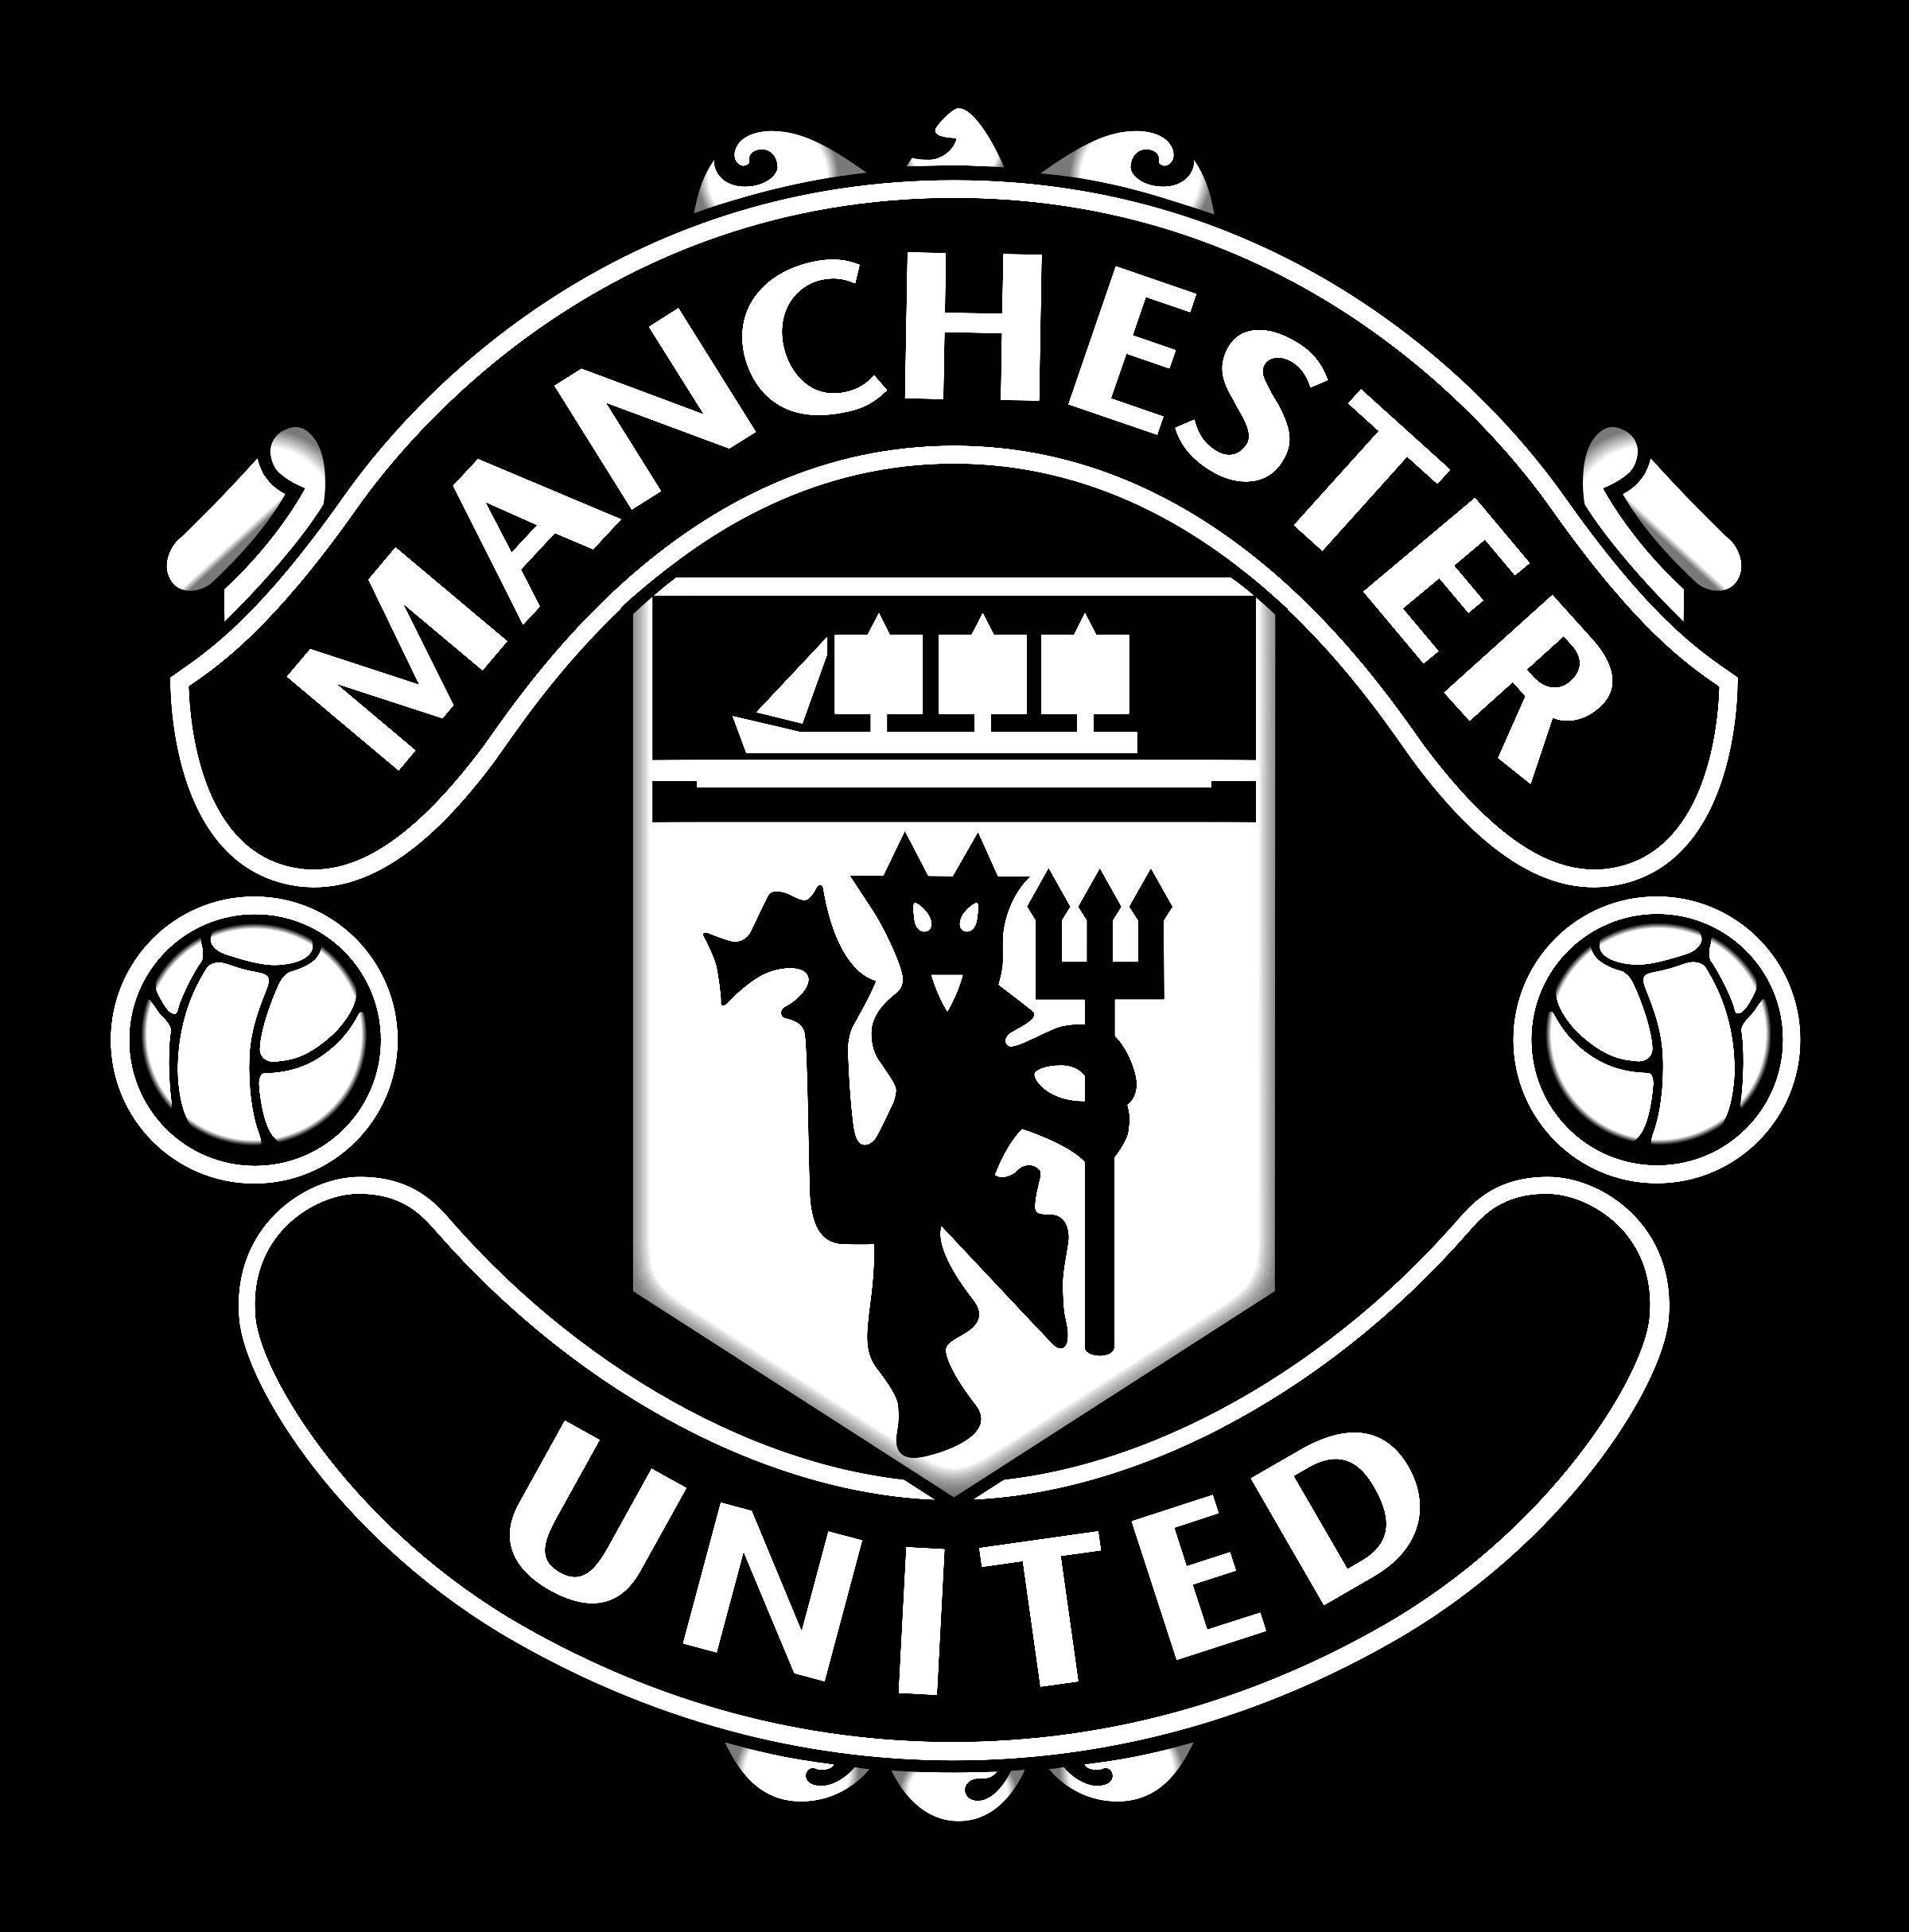 Football clipart logo image freeuse stock Manchester United Logo Clipart logo - Free Clipart on ... image freeuse stock